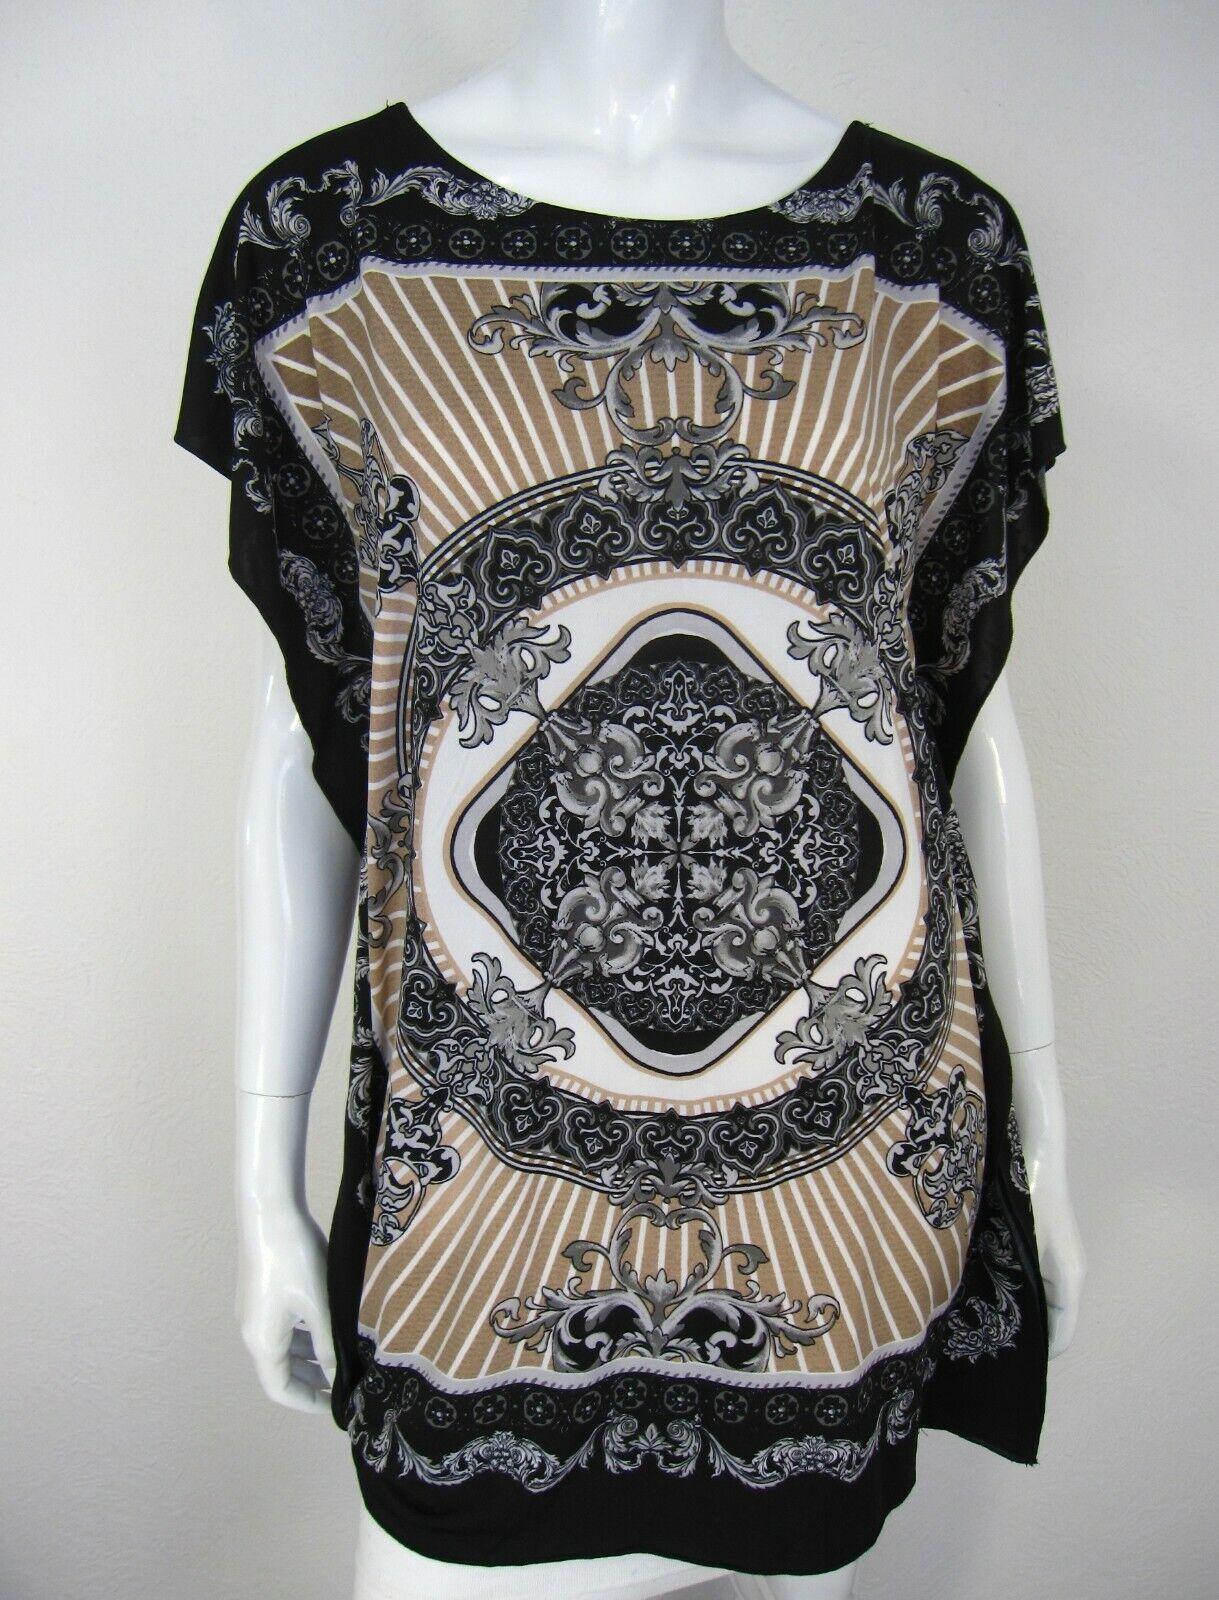 Metaphor NWT Short Sleeve TOP Blouse Größe L Large schwarz braun Paisley